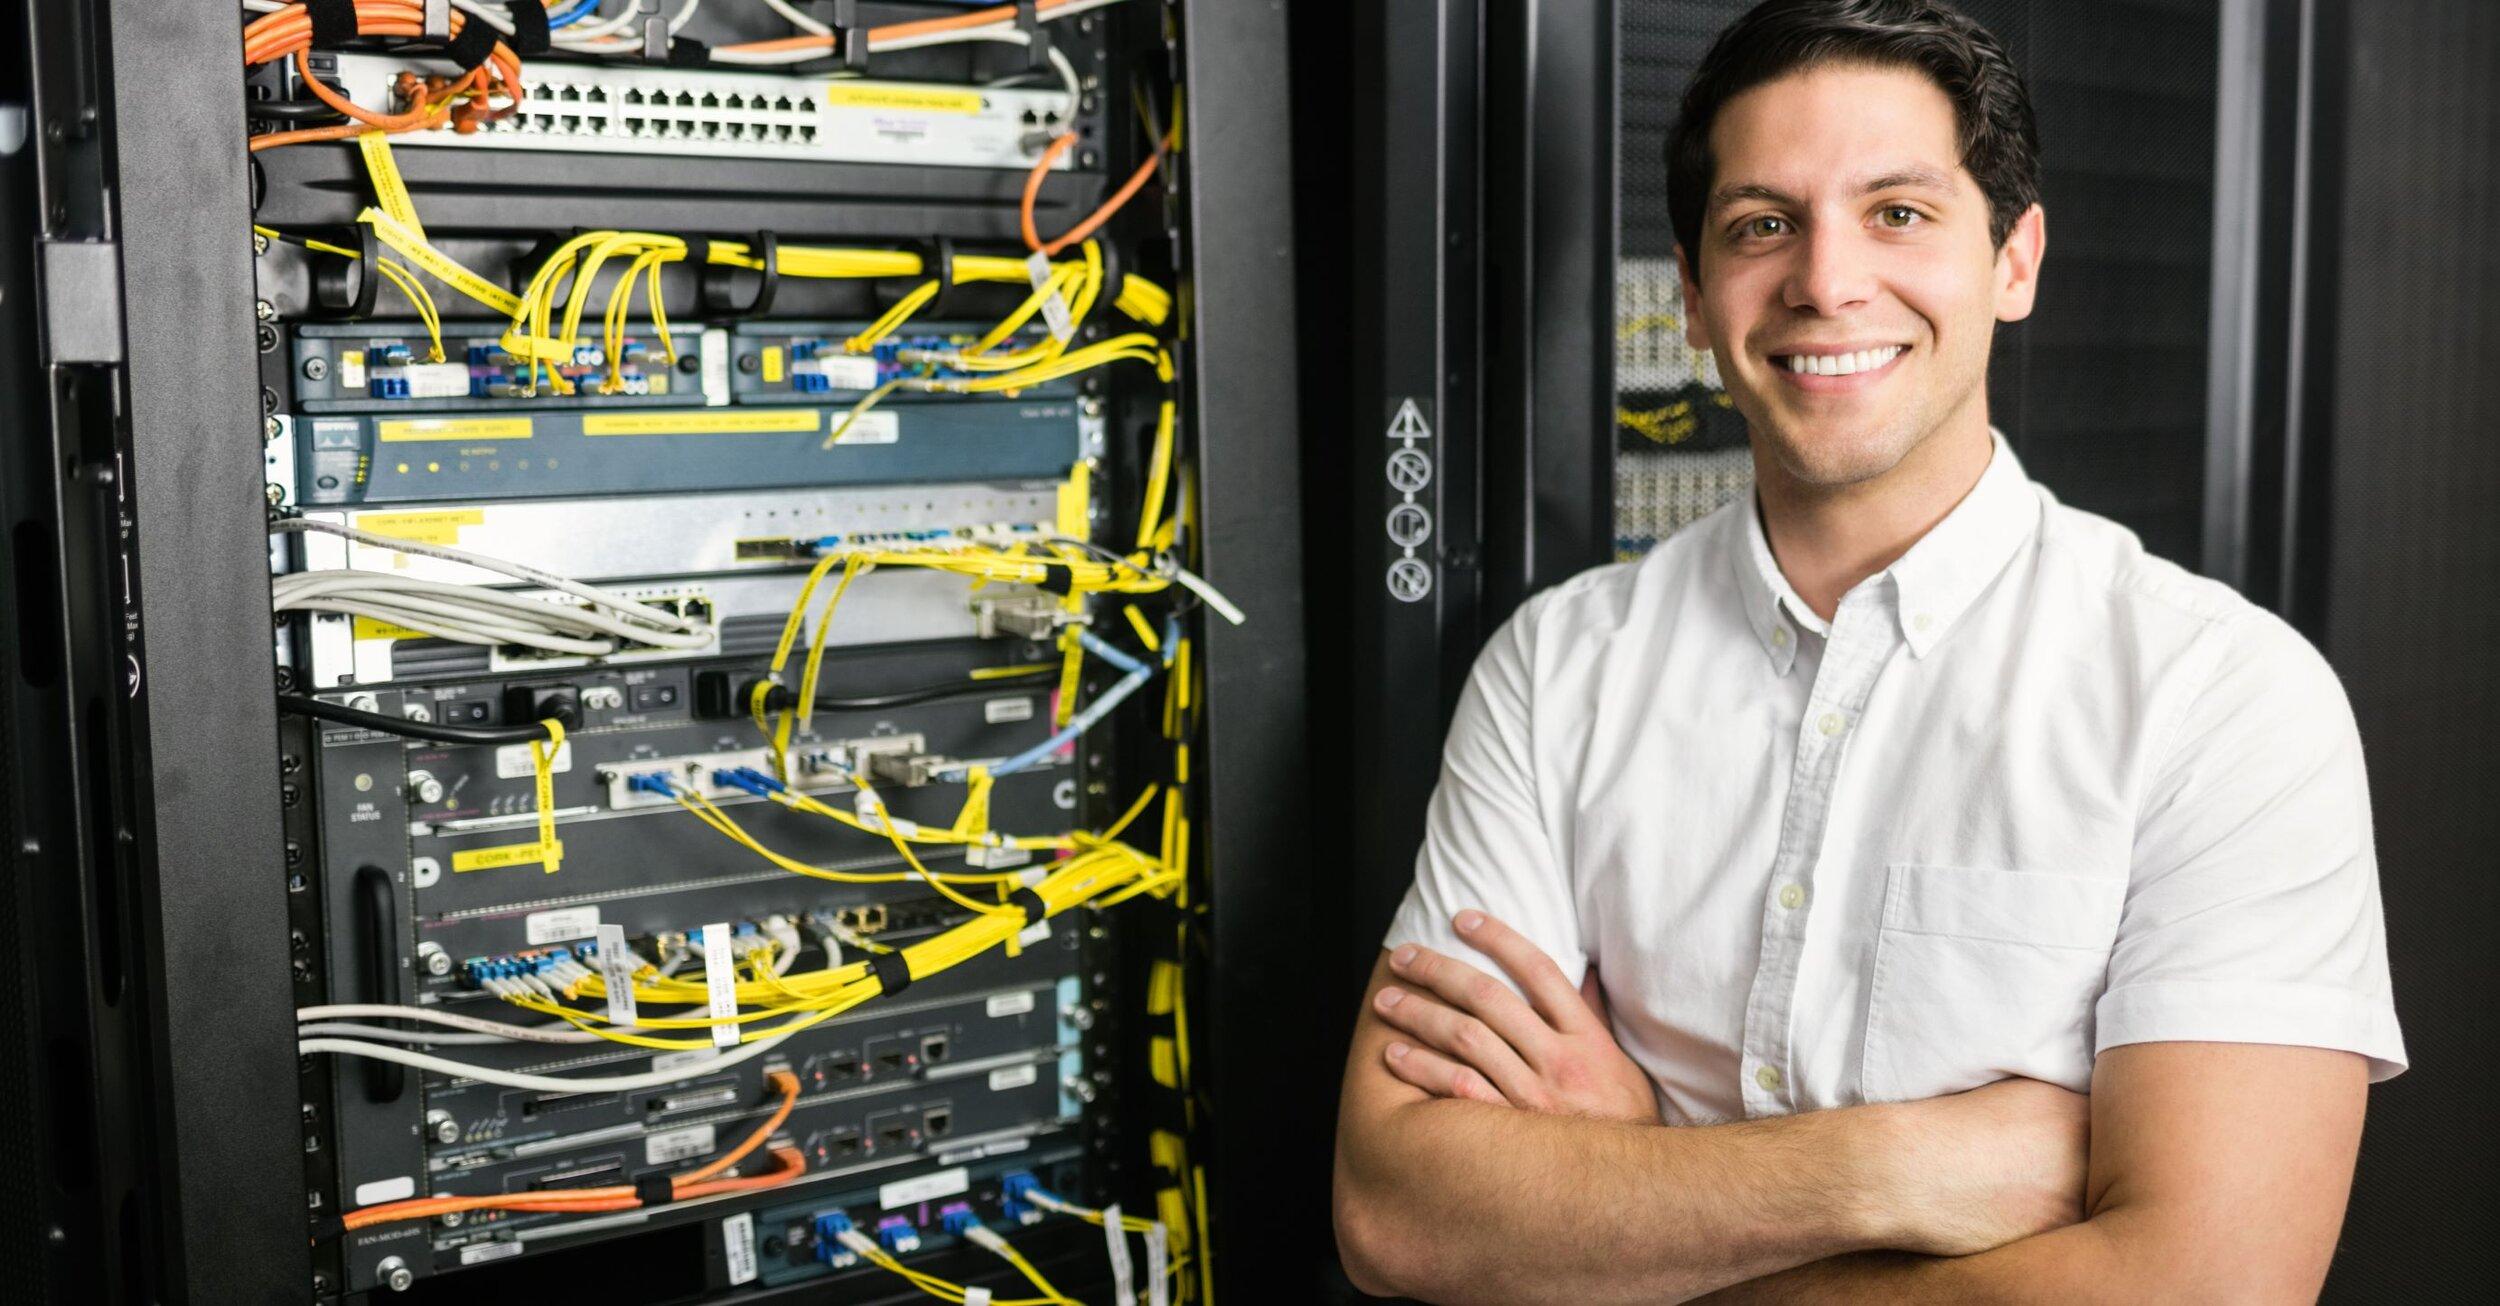 Happy Network Engineer - Smaller.jpg